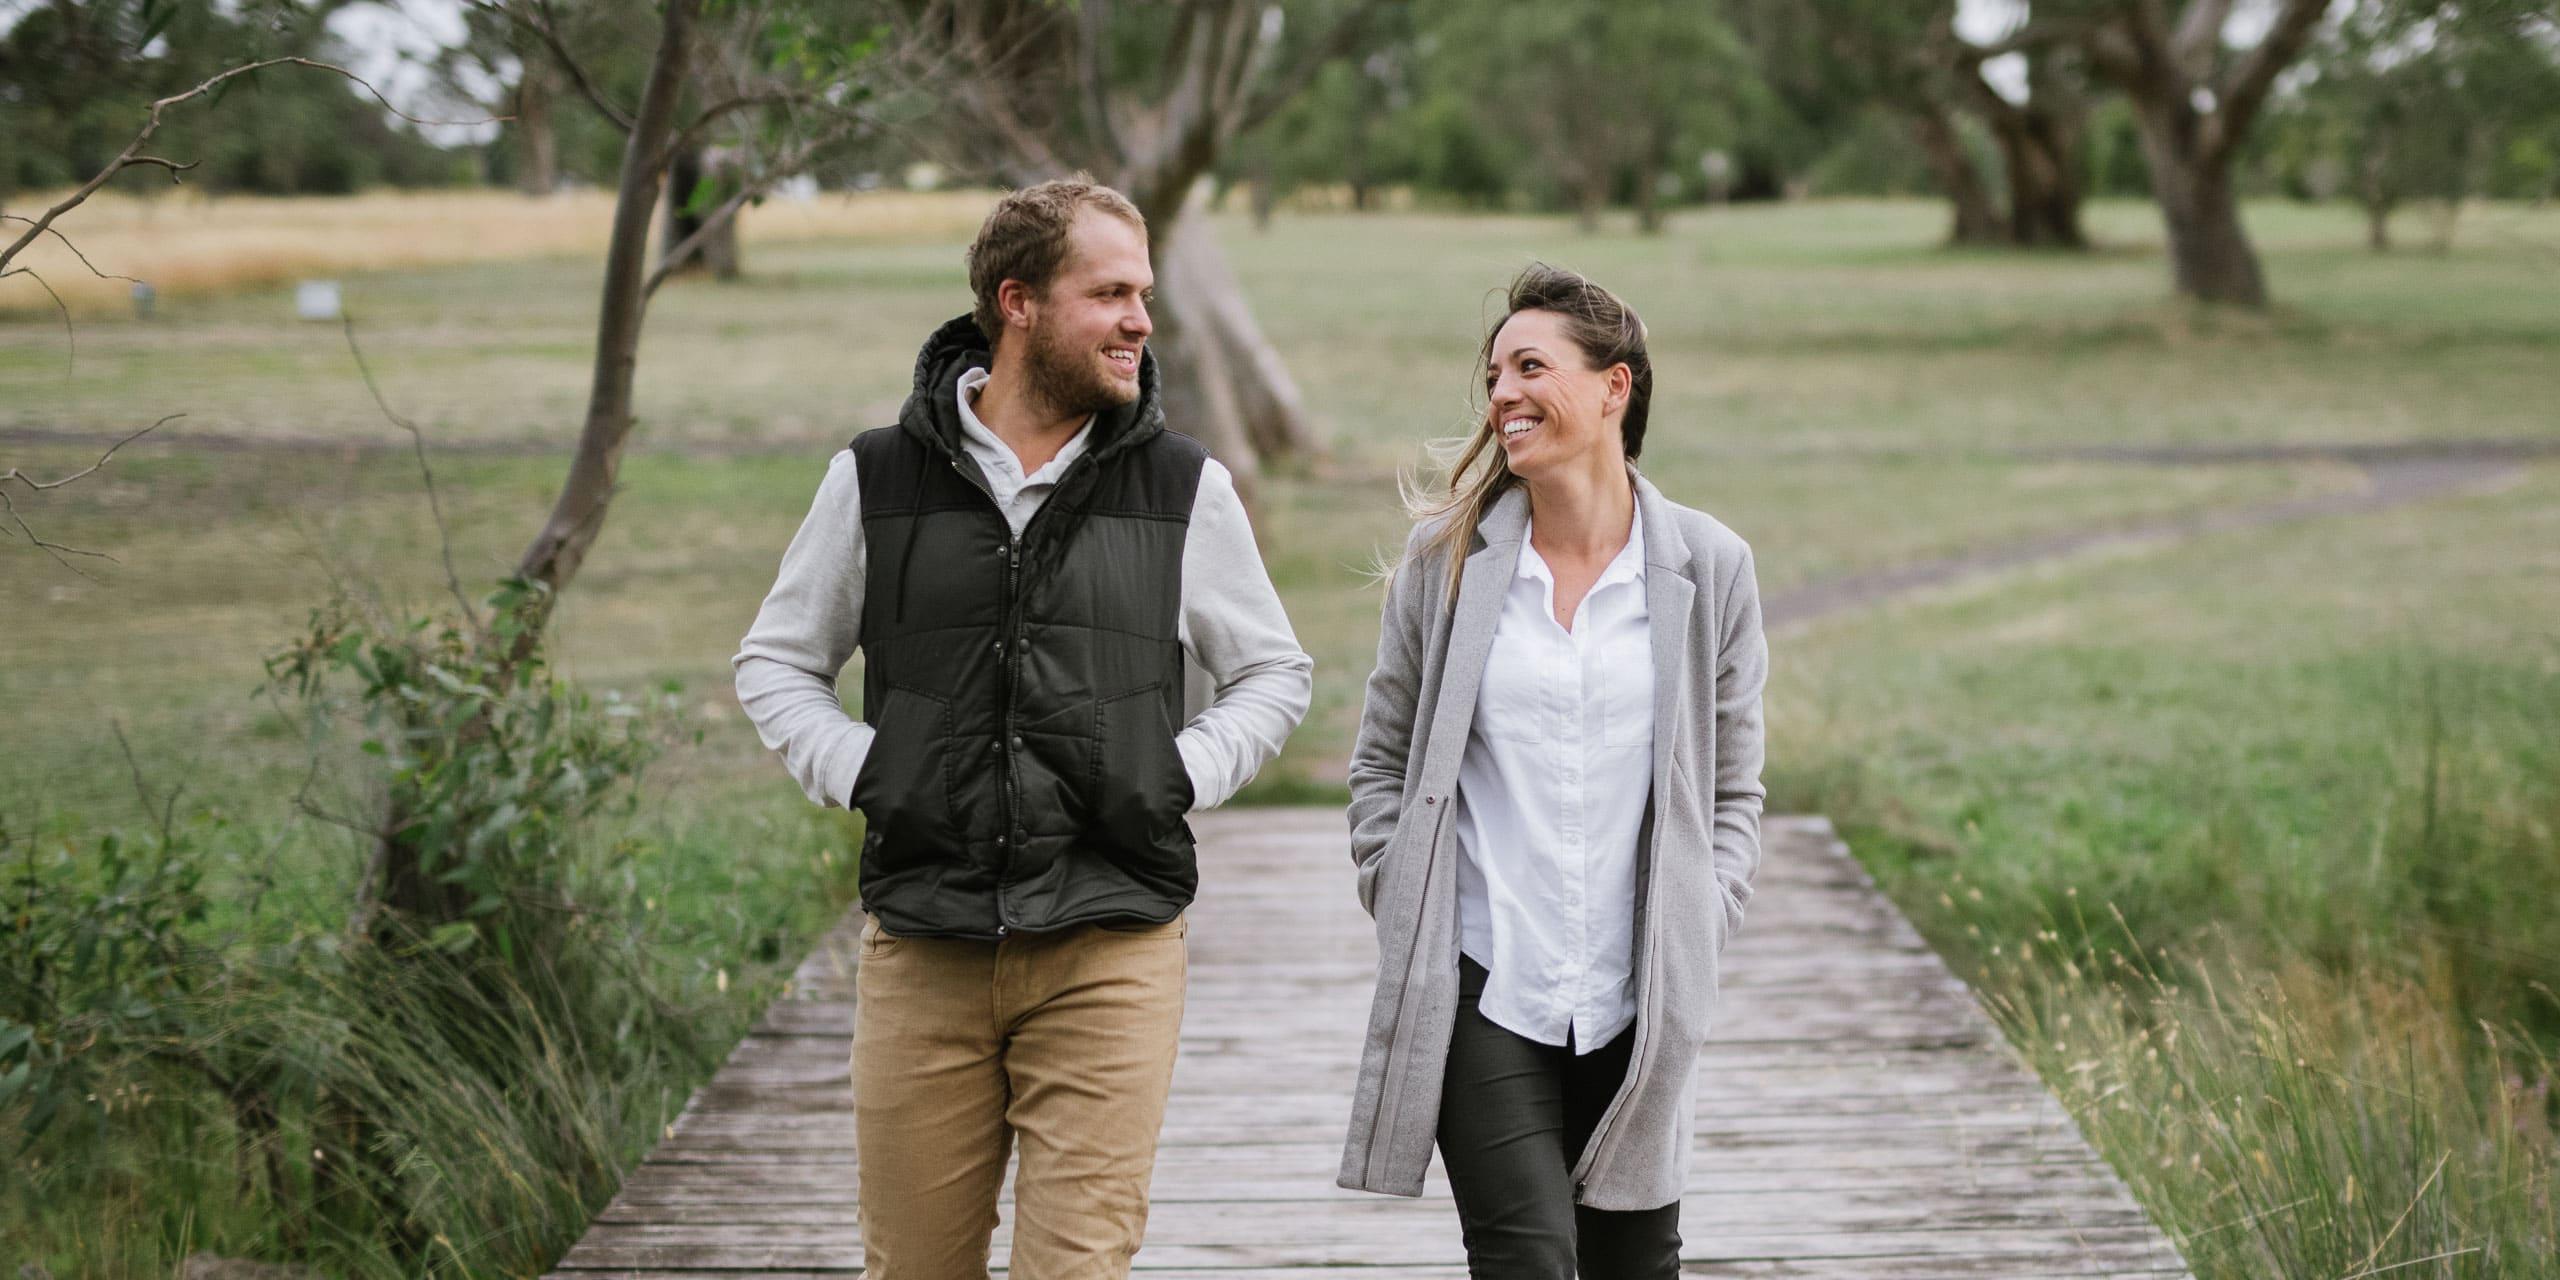 Portrait of couple in love walking towards camera